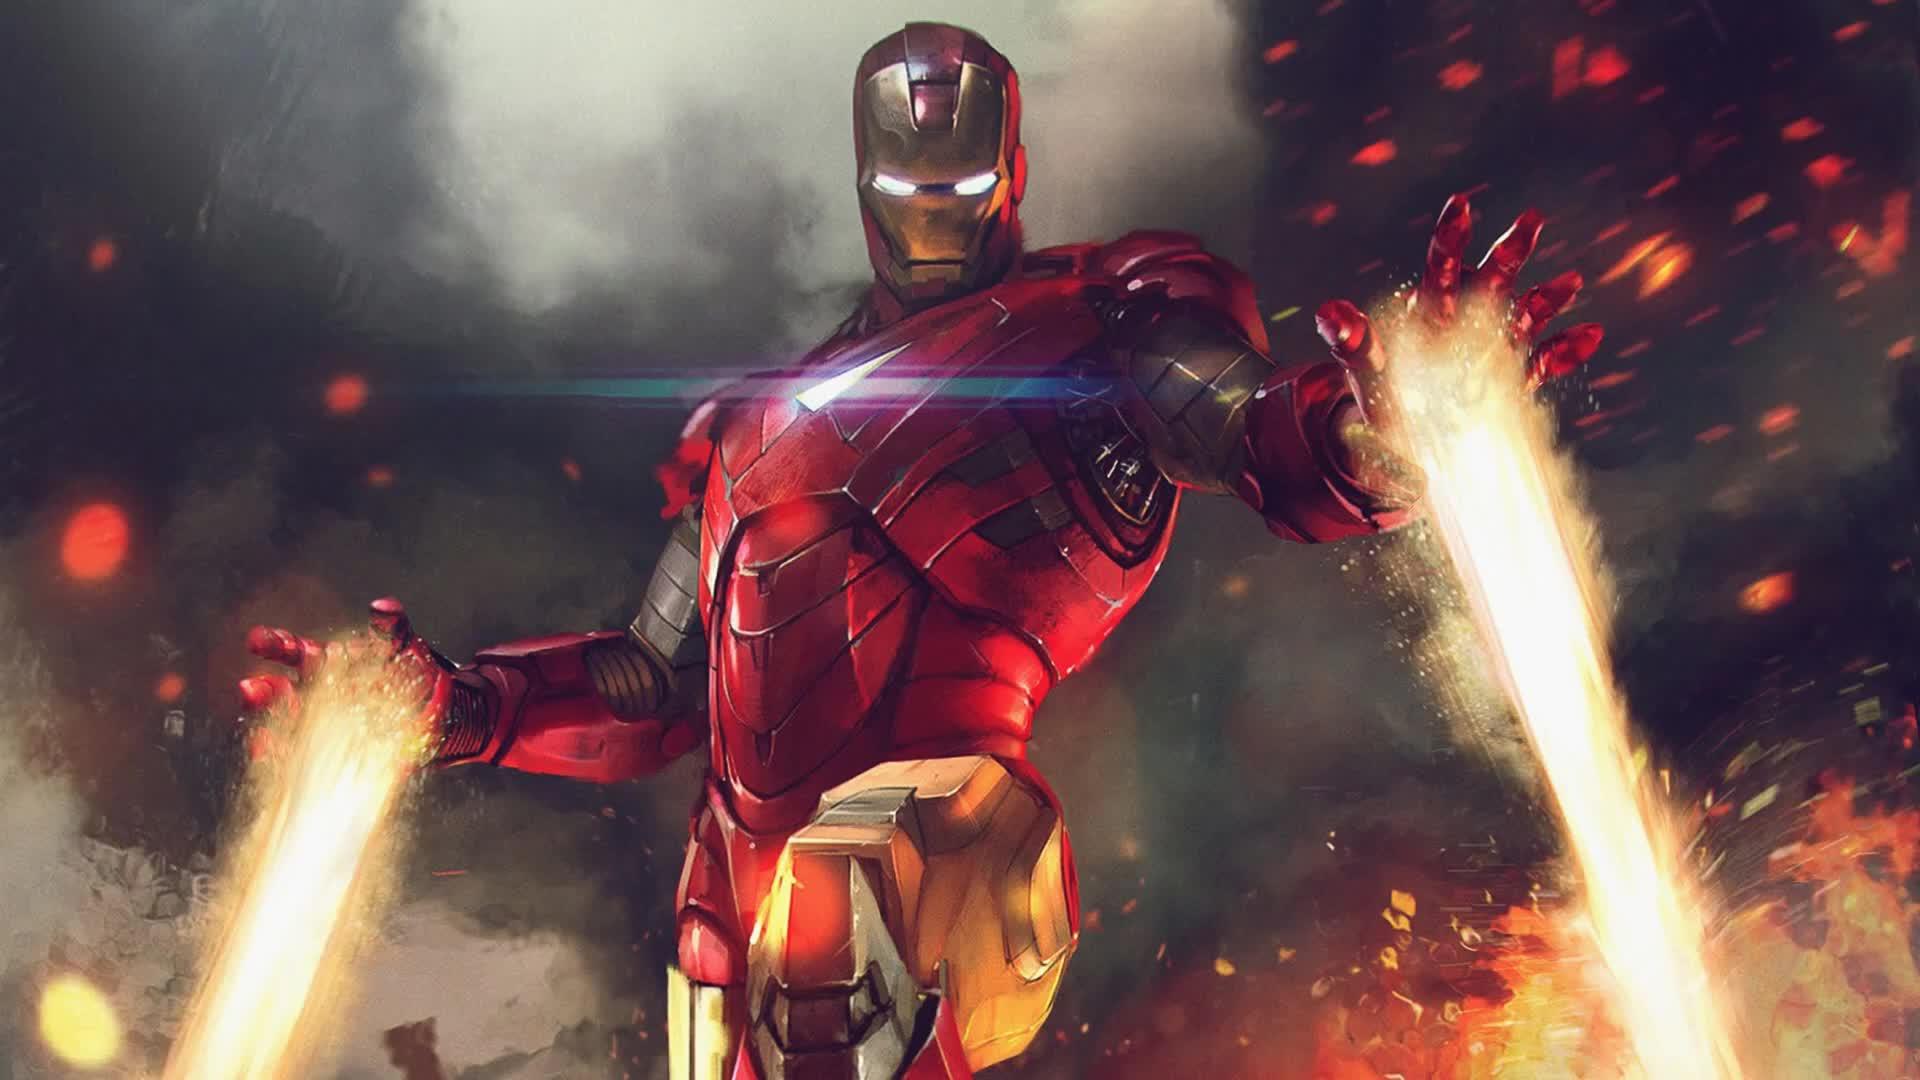 Iron Man Superheroes Marvel War Of Heroes Live Wallpaper - Every Journey Has An End Iron Man - HD Wallpaper